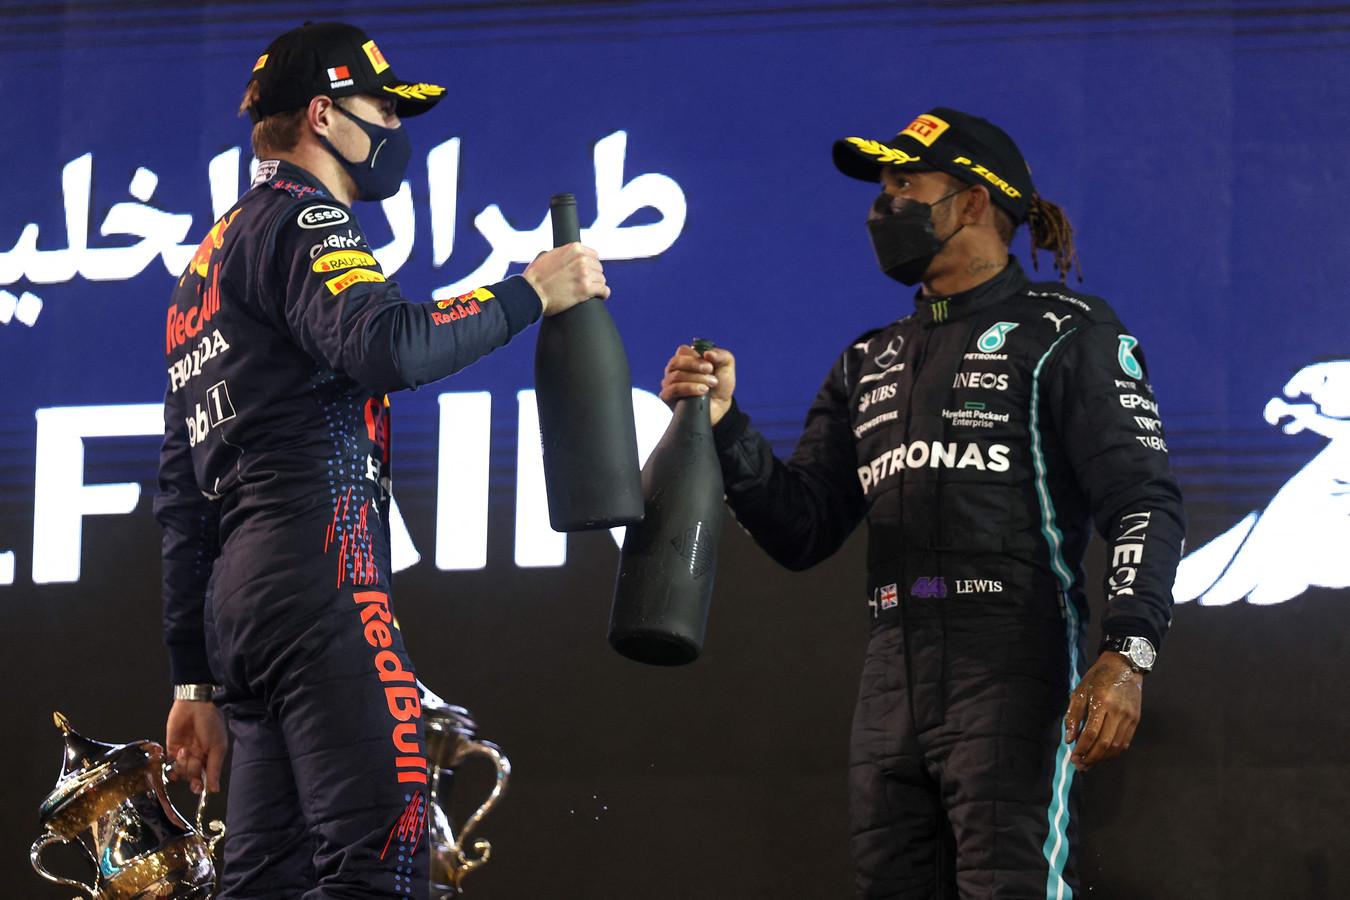 Max Verstappen en Lewis Hamilton tijdens de podiumceremonie in Bahrein.